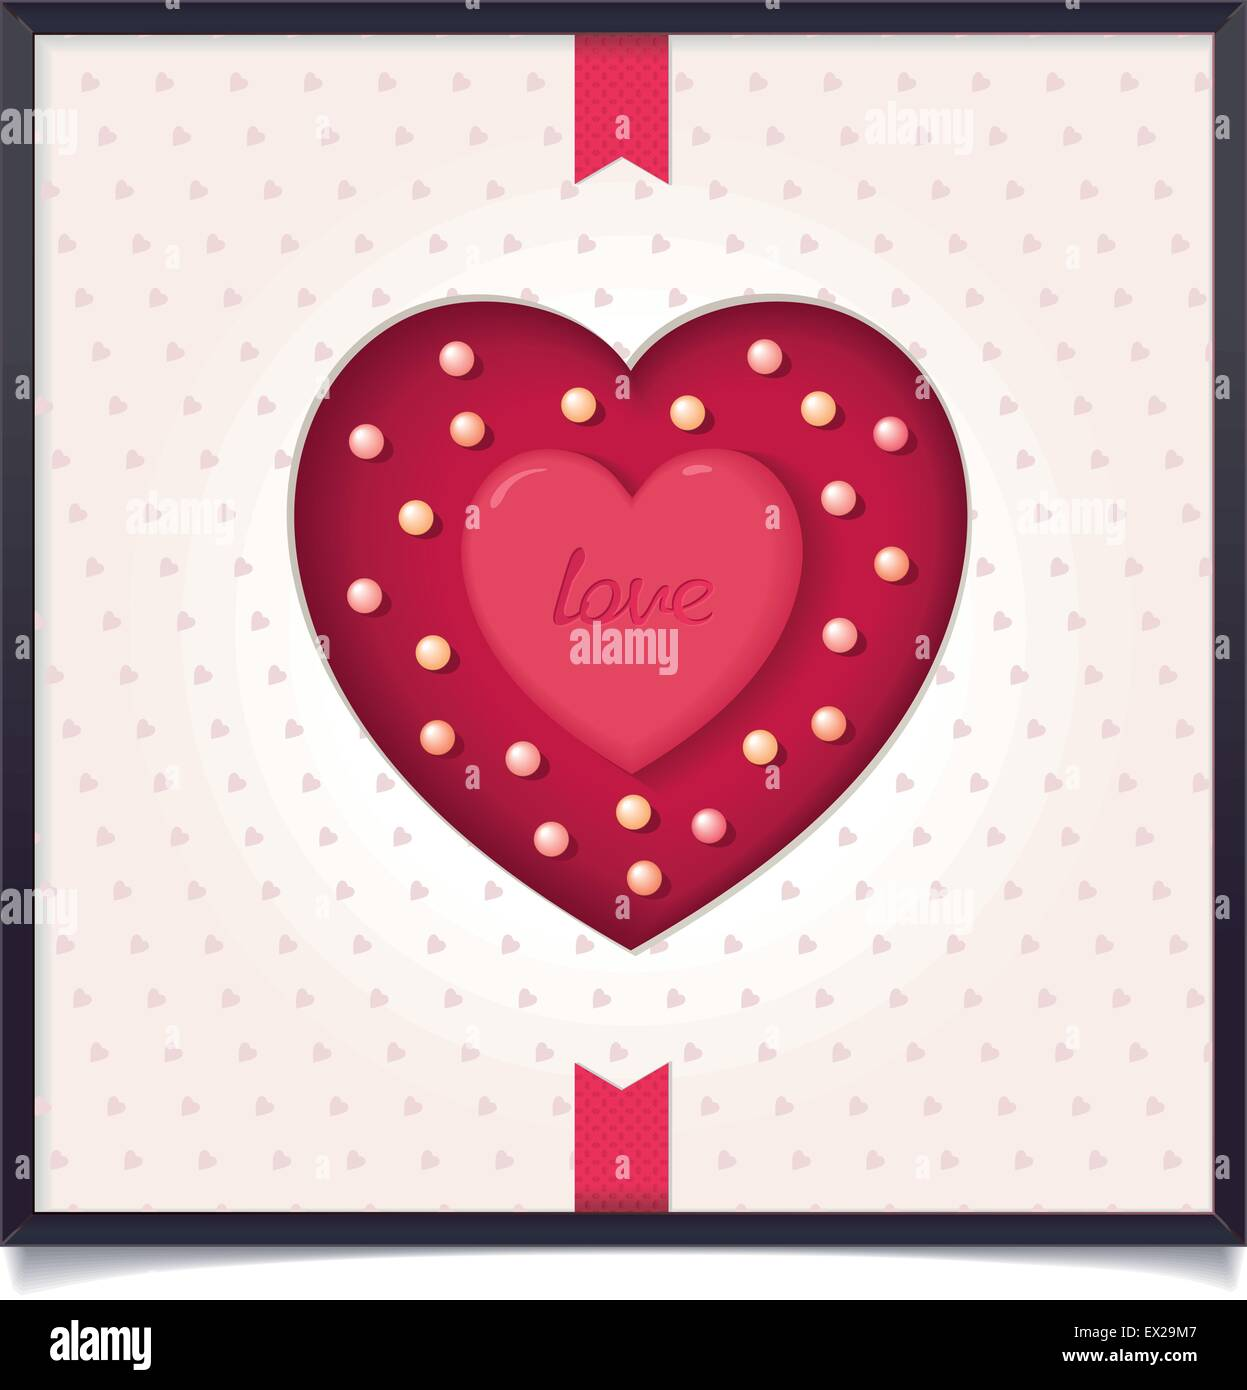 Trendy Heart Stockfotos & Trendy Heart Bilder - Seite 2 - Alamy